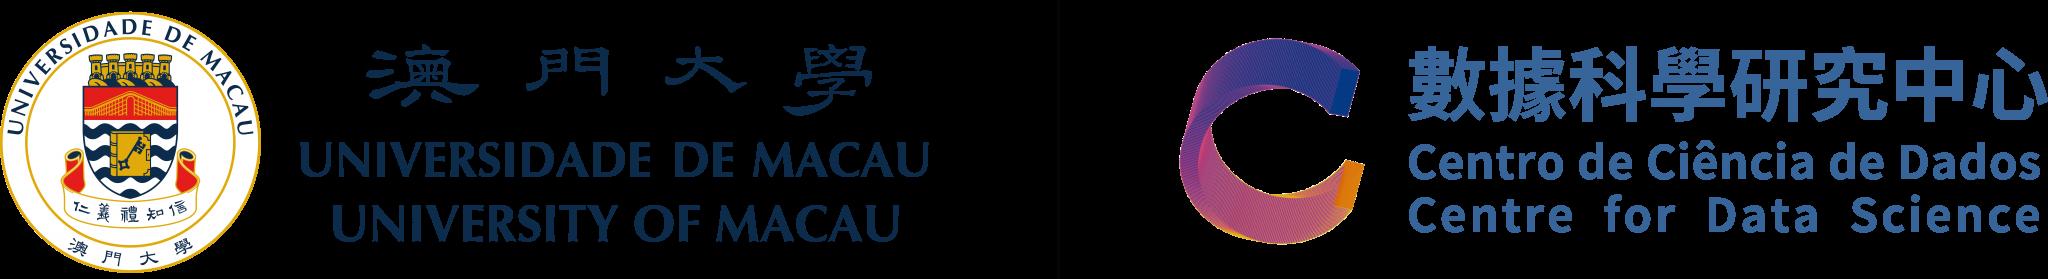 University of Macau | Centre for Data Science Logo